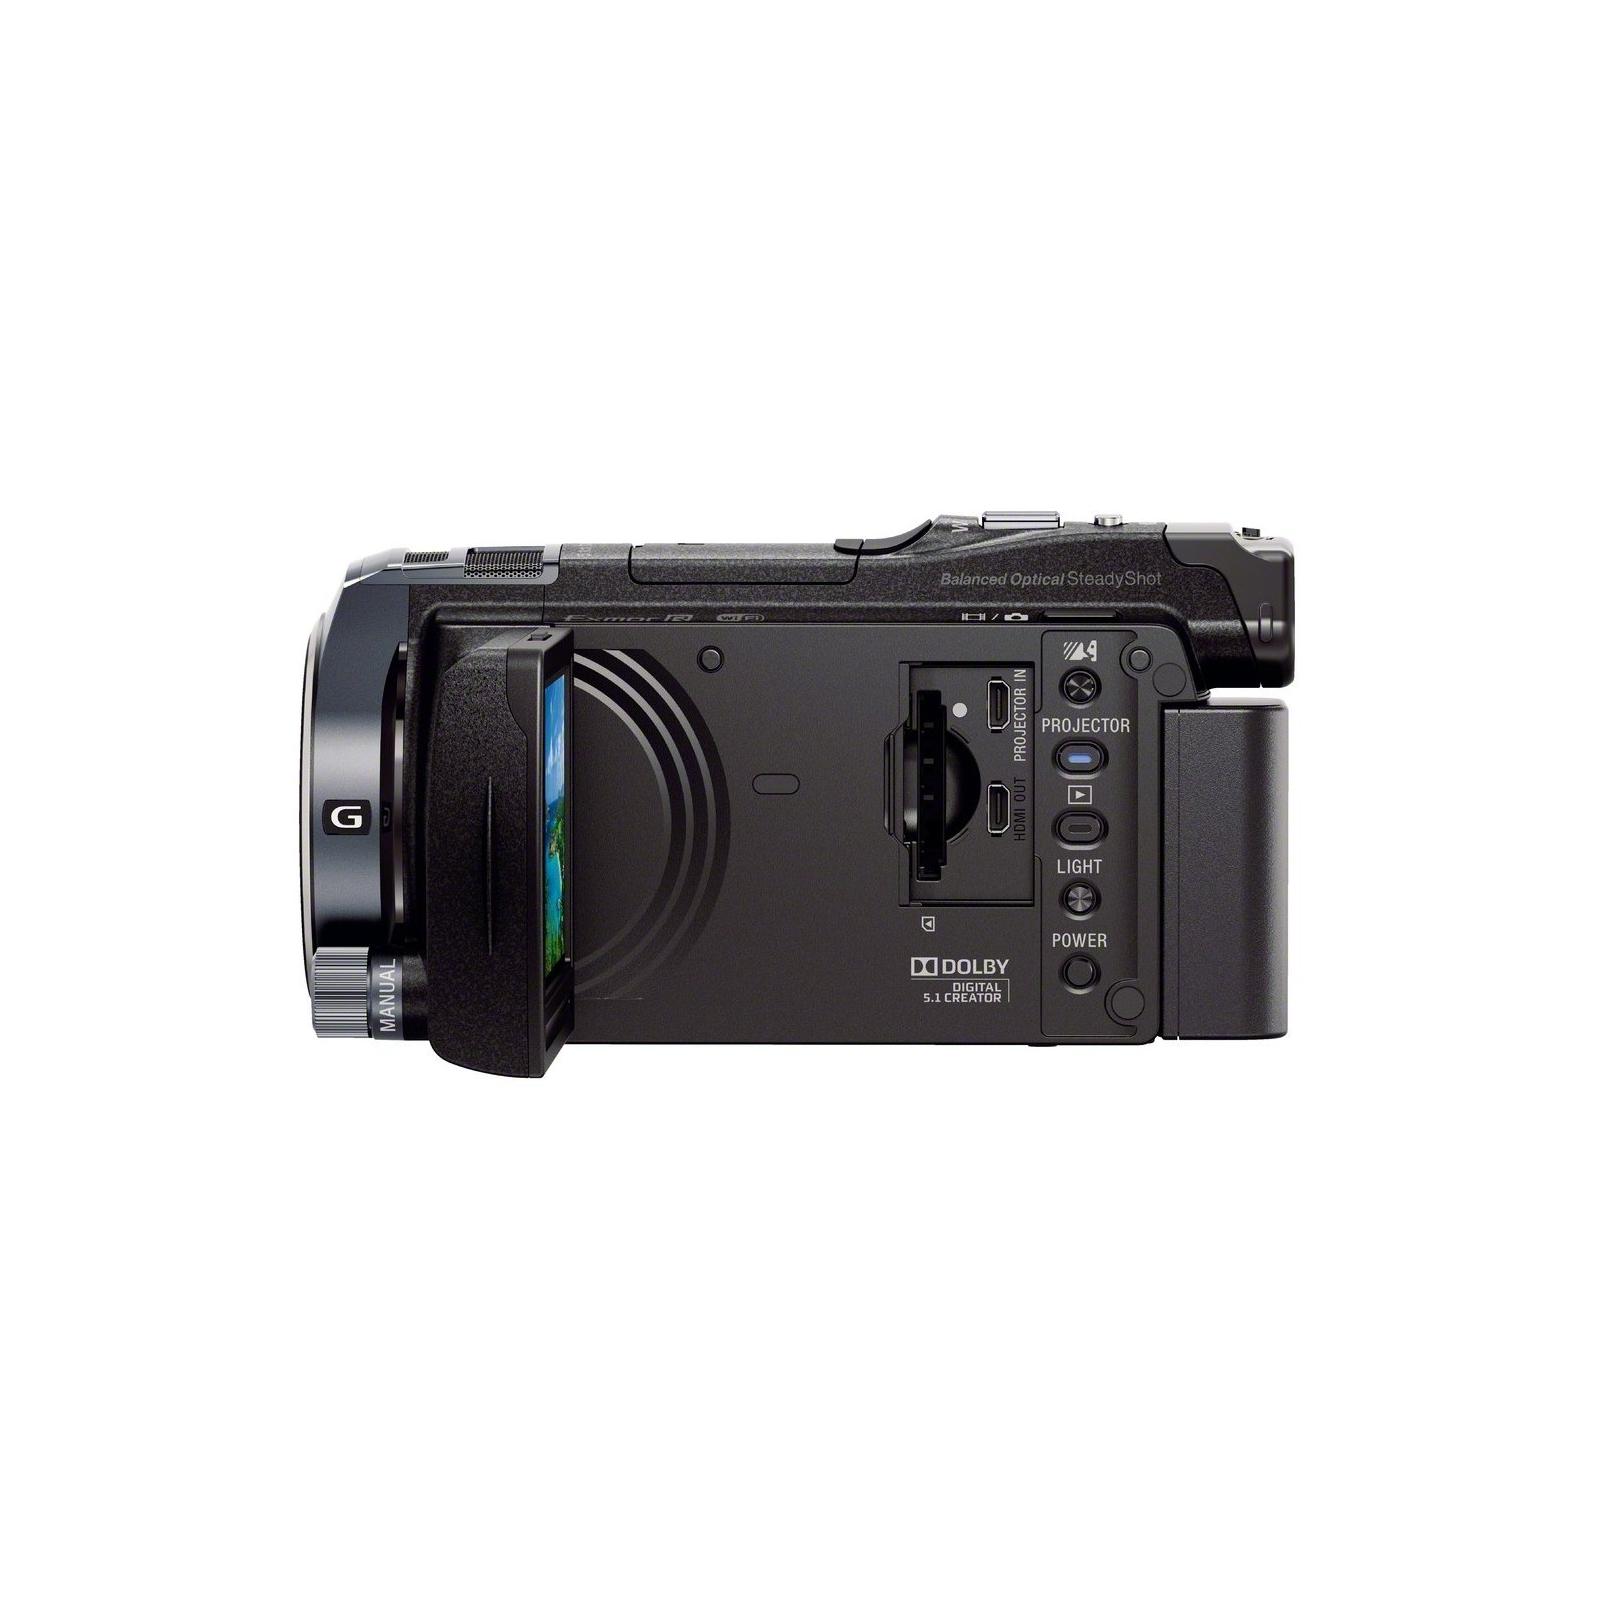 Цифровая видеокамера SONY Handycam HDR-PJ810 Black (HDRPJ810EB.CEL) изображение 7